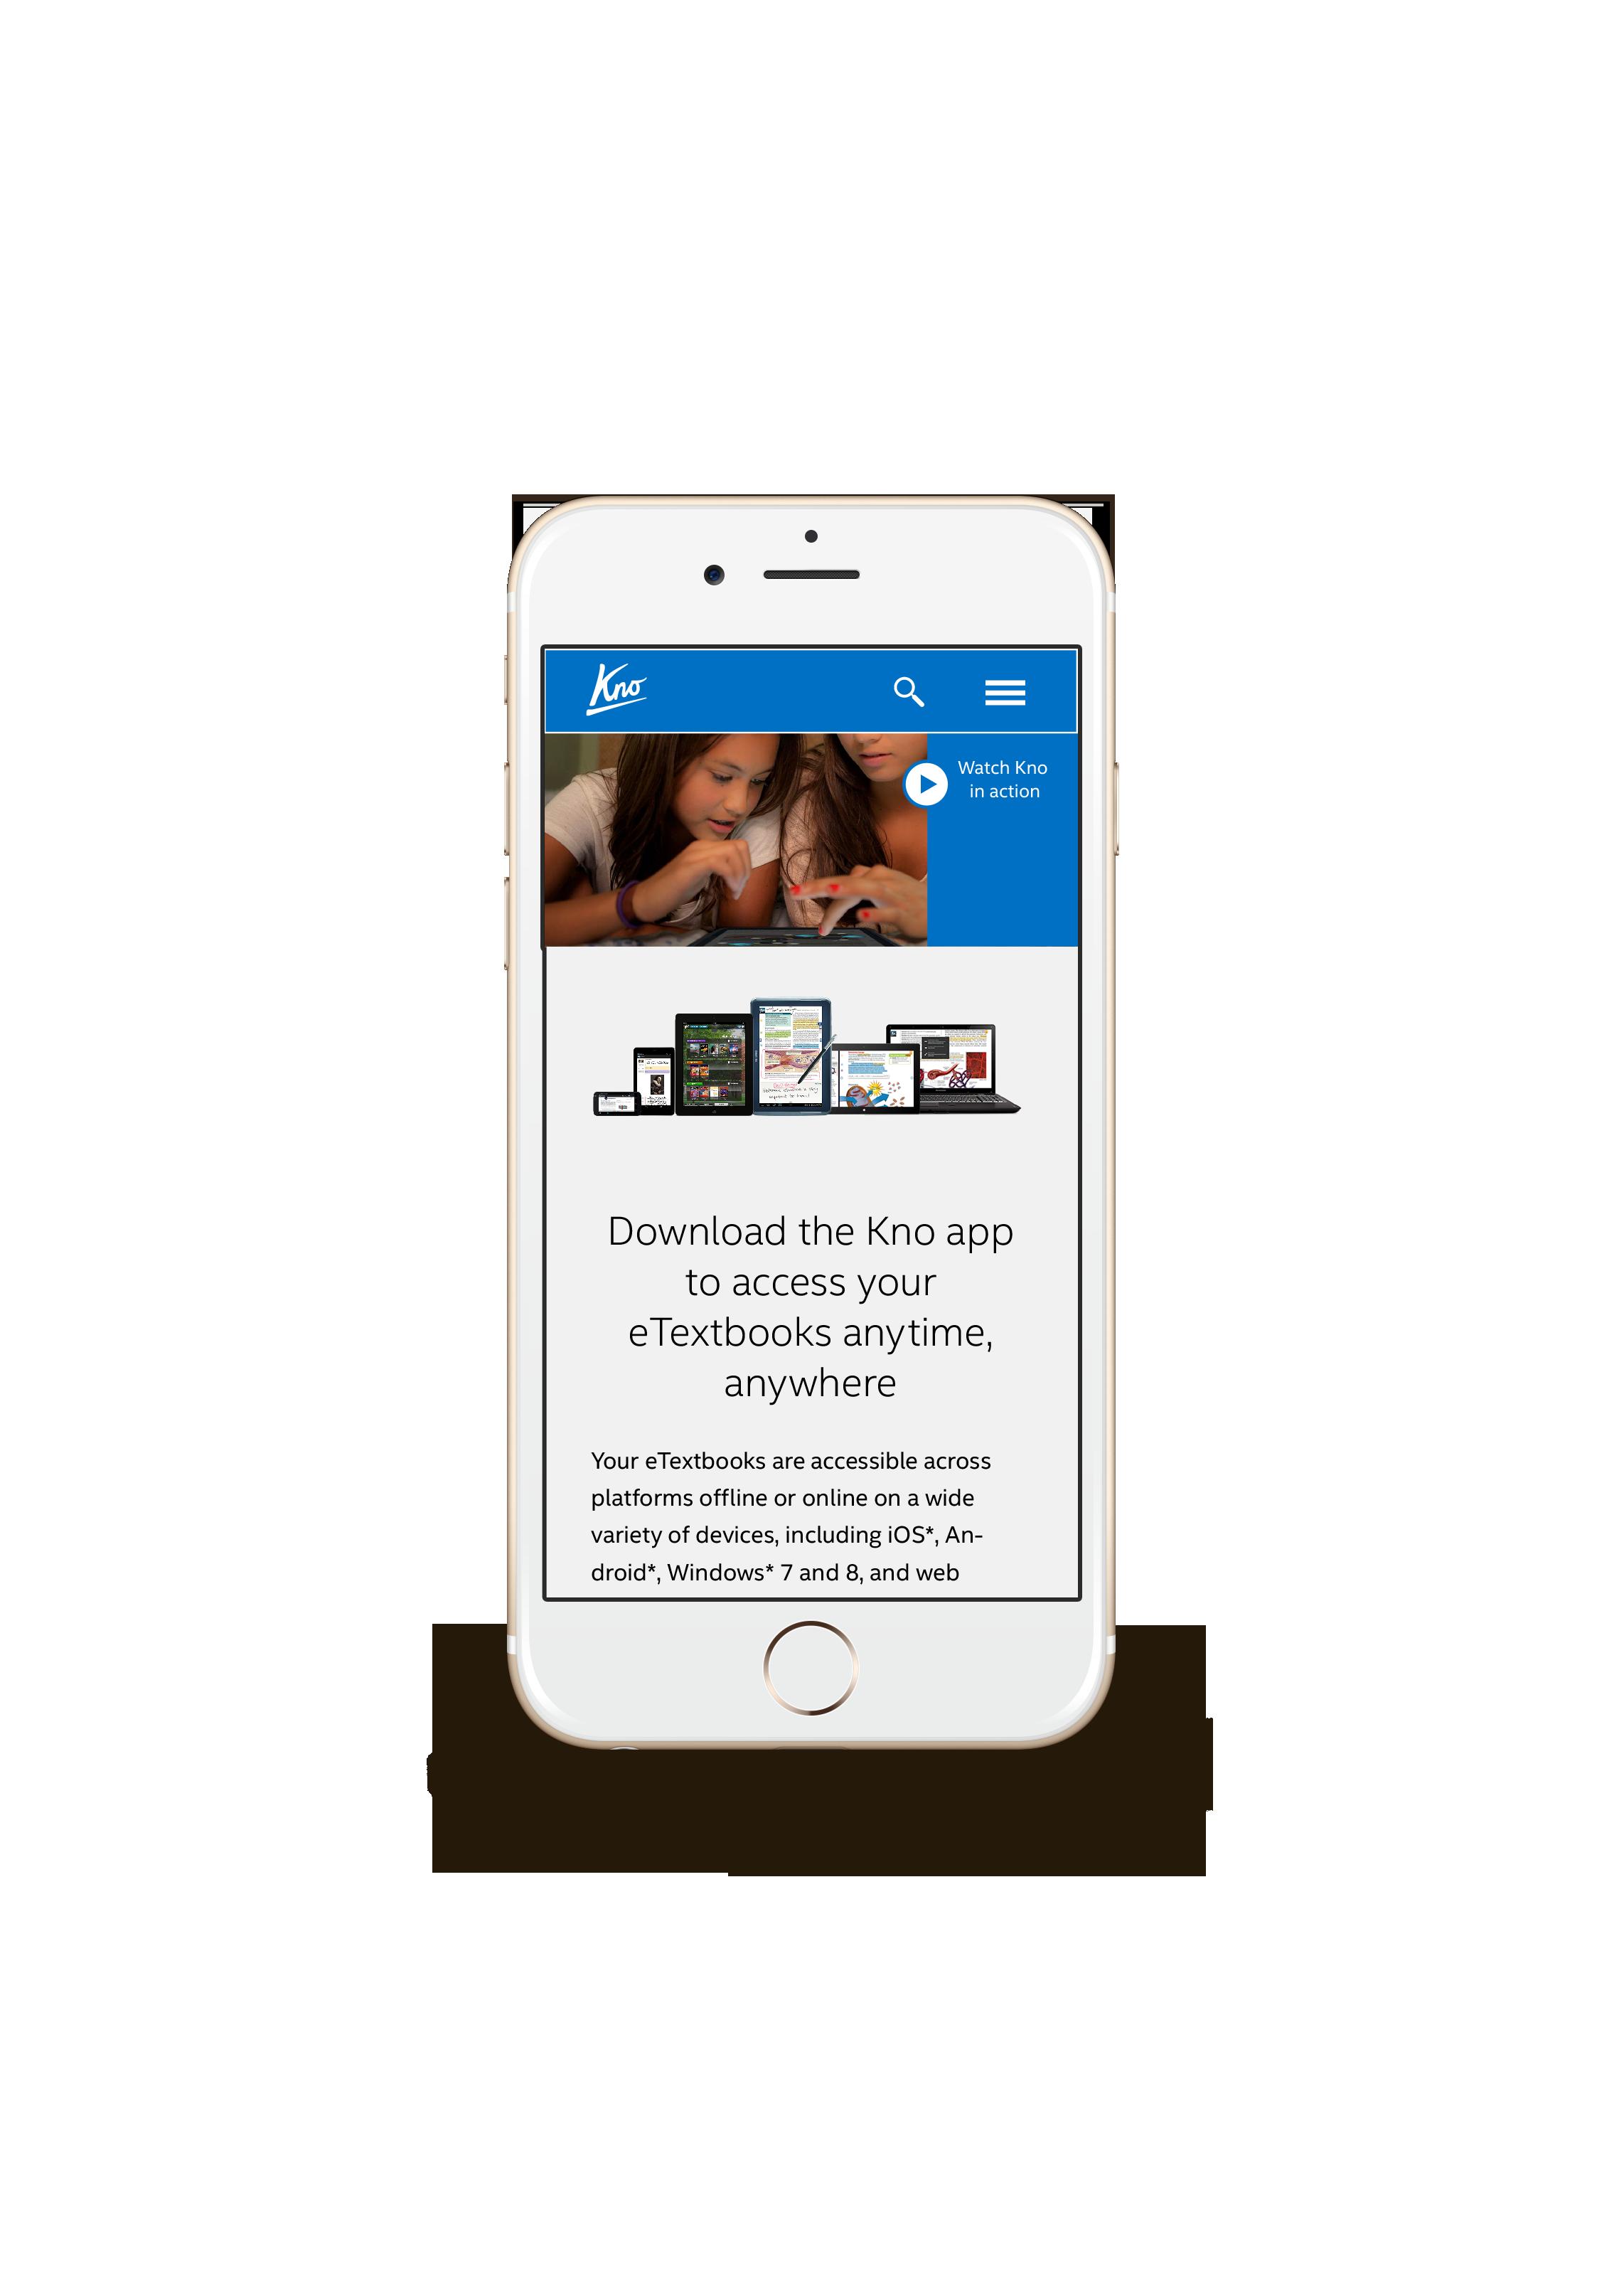 nddsite_new_mobile_news.png